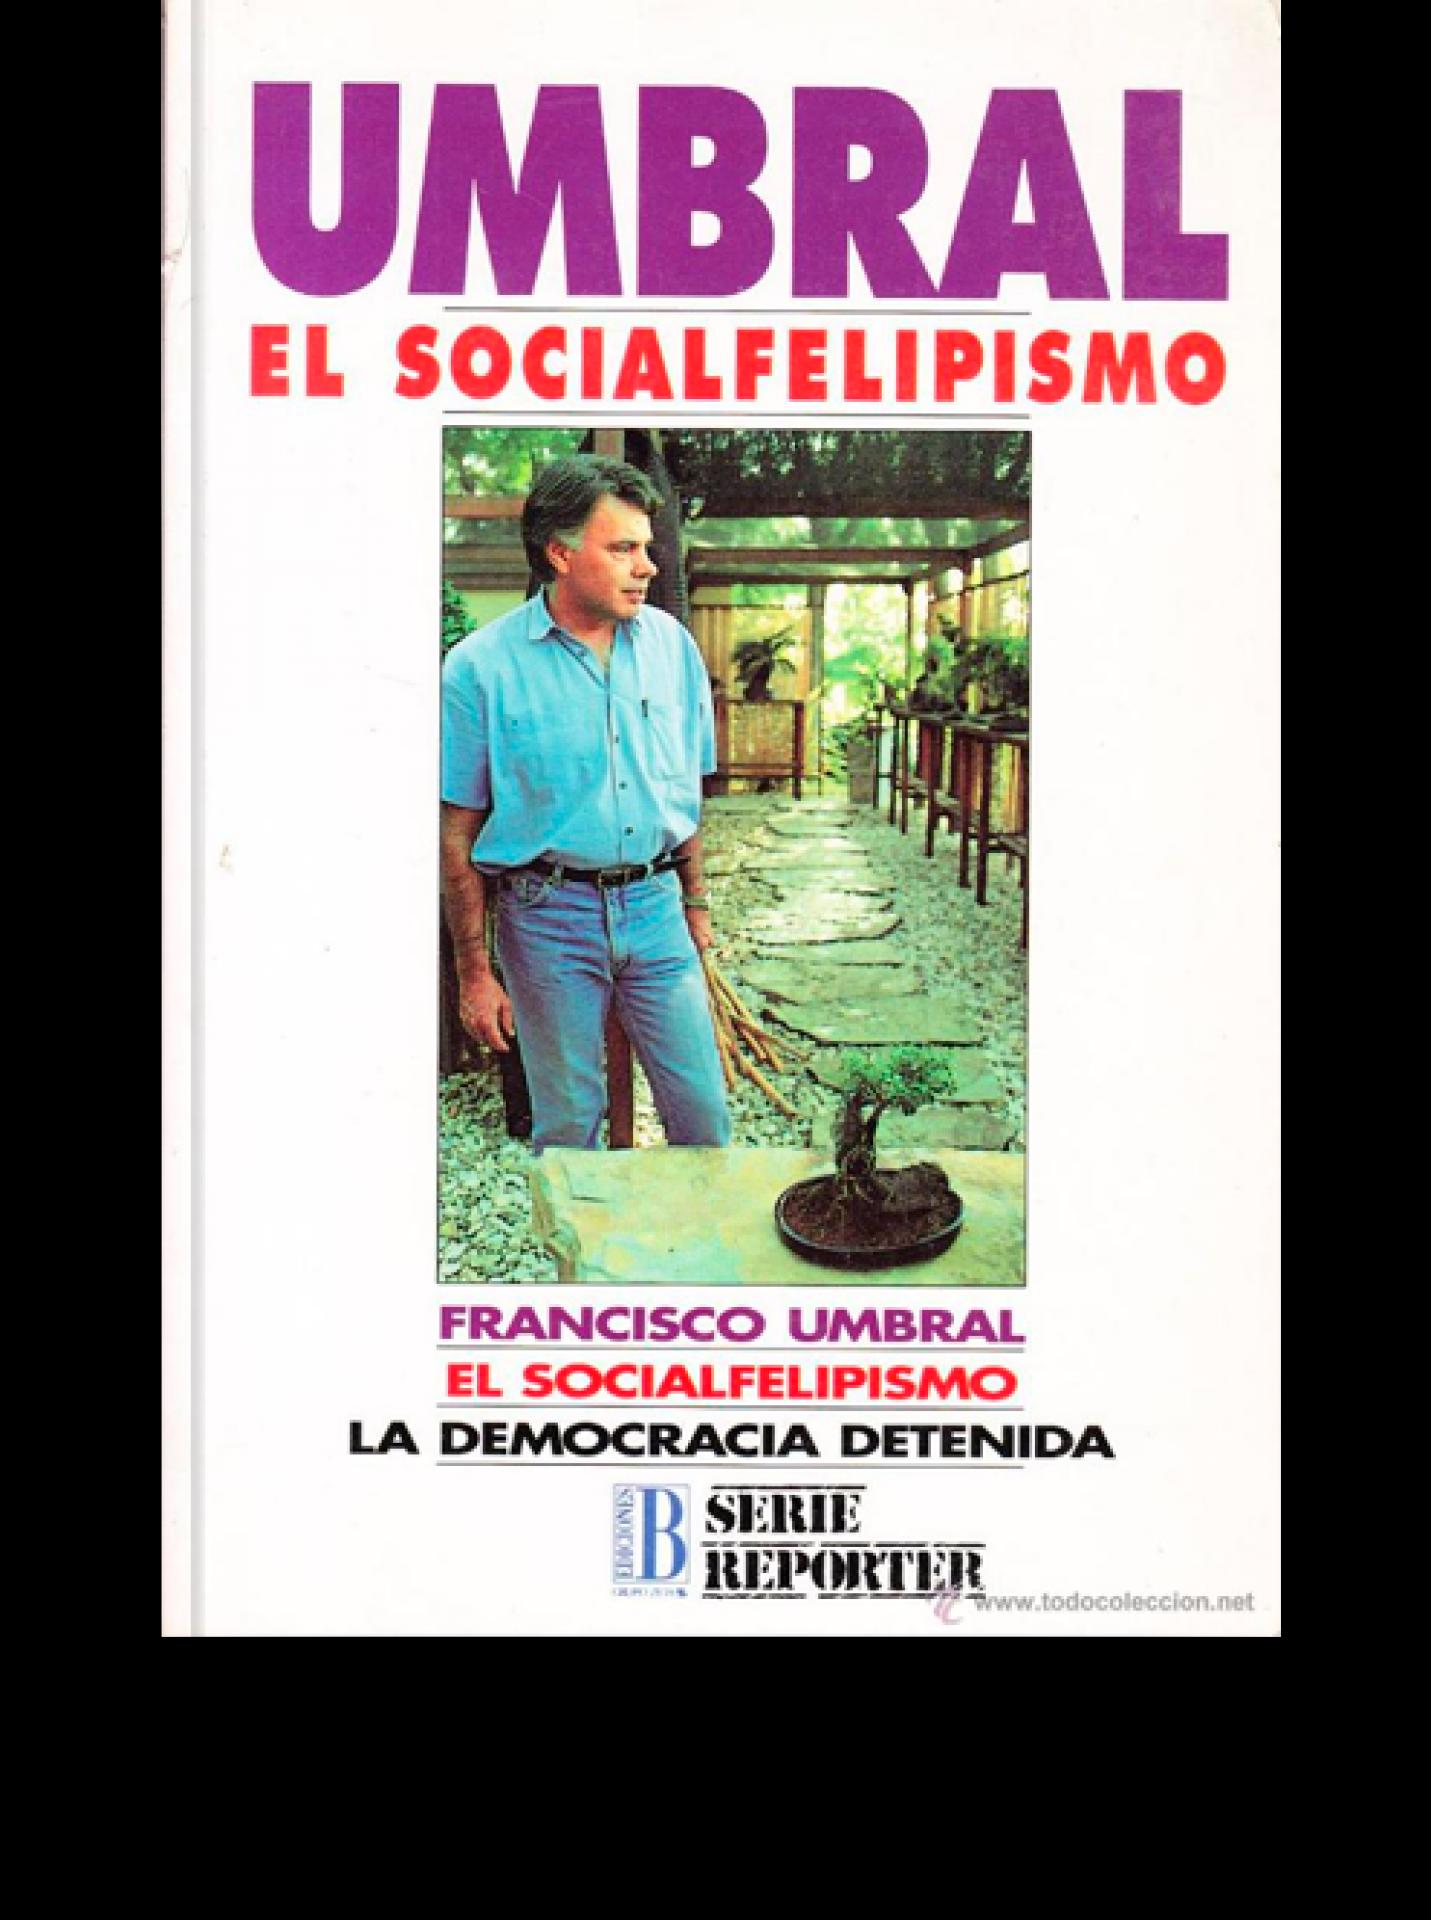 El socialfelipismo: la democracia detenida